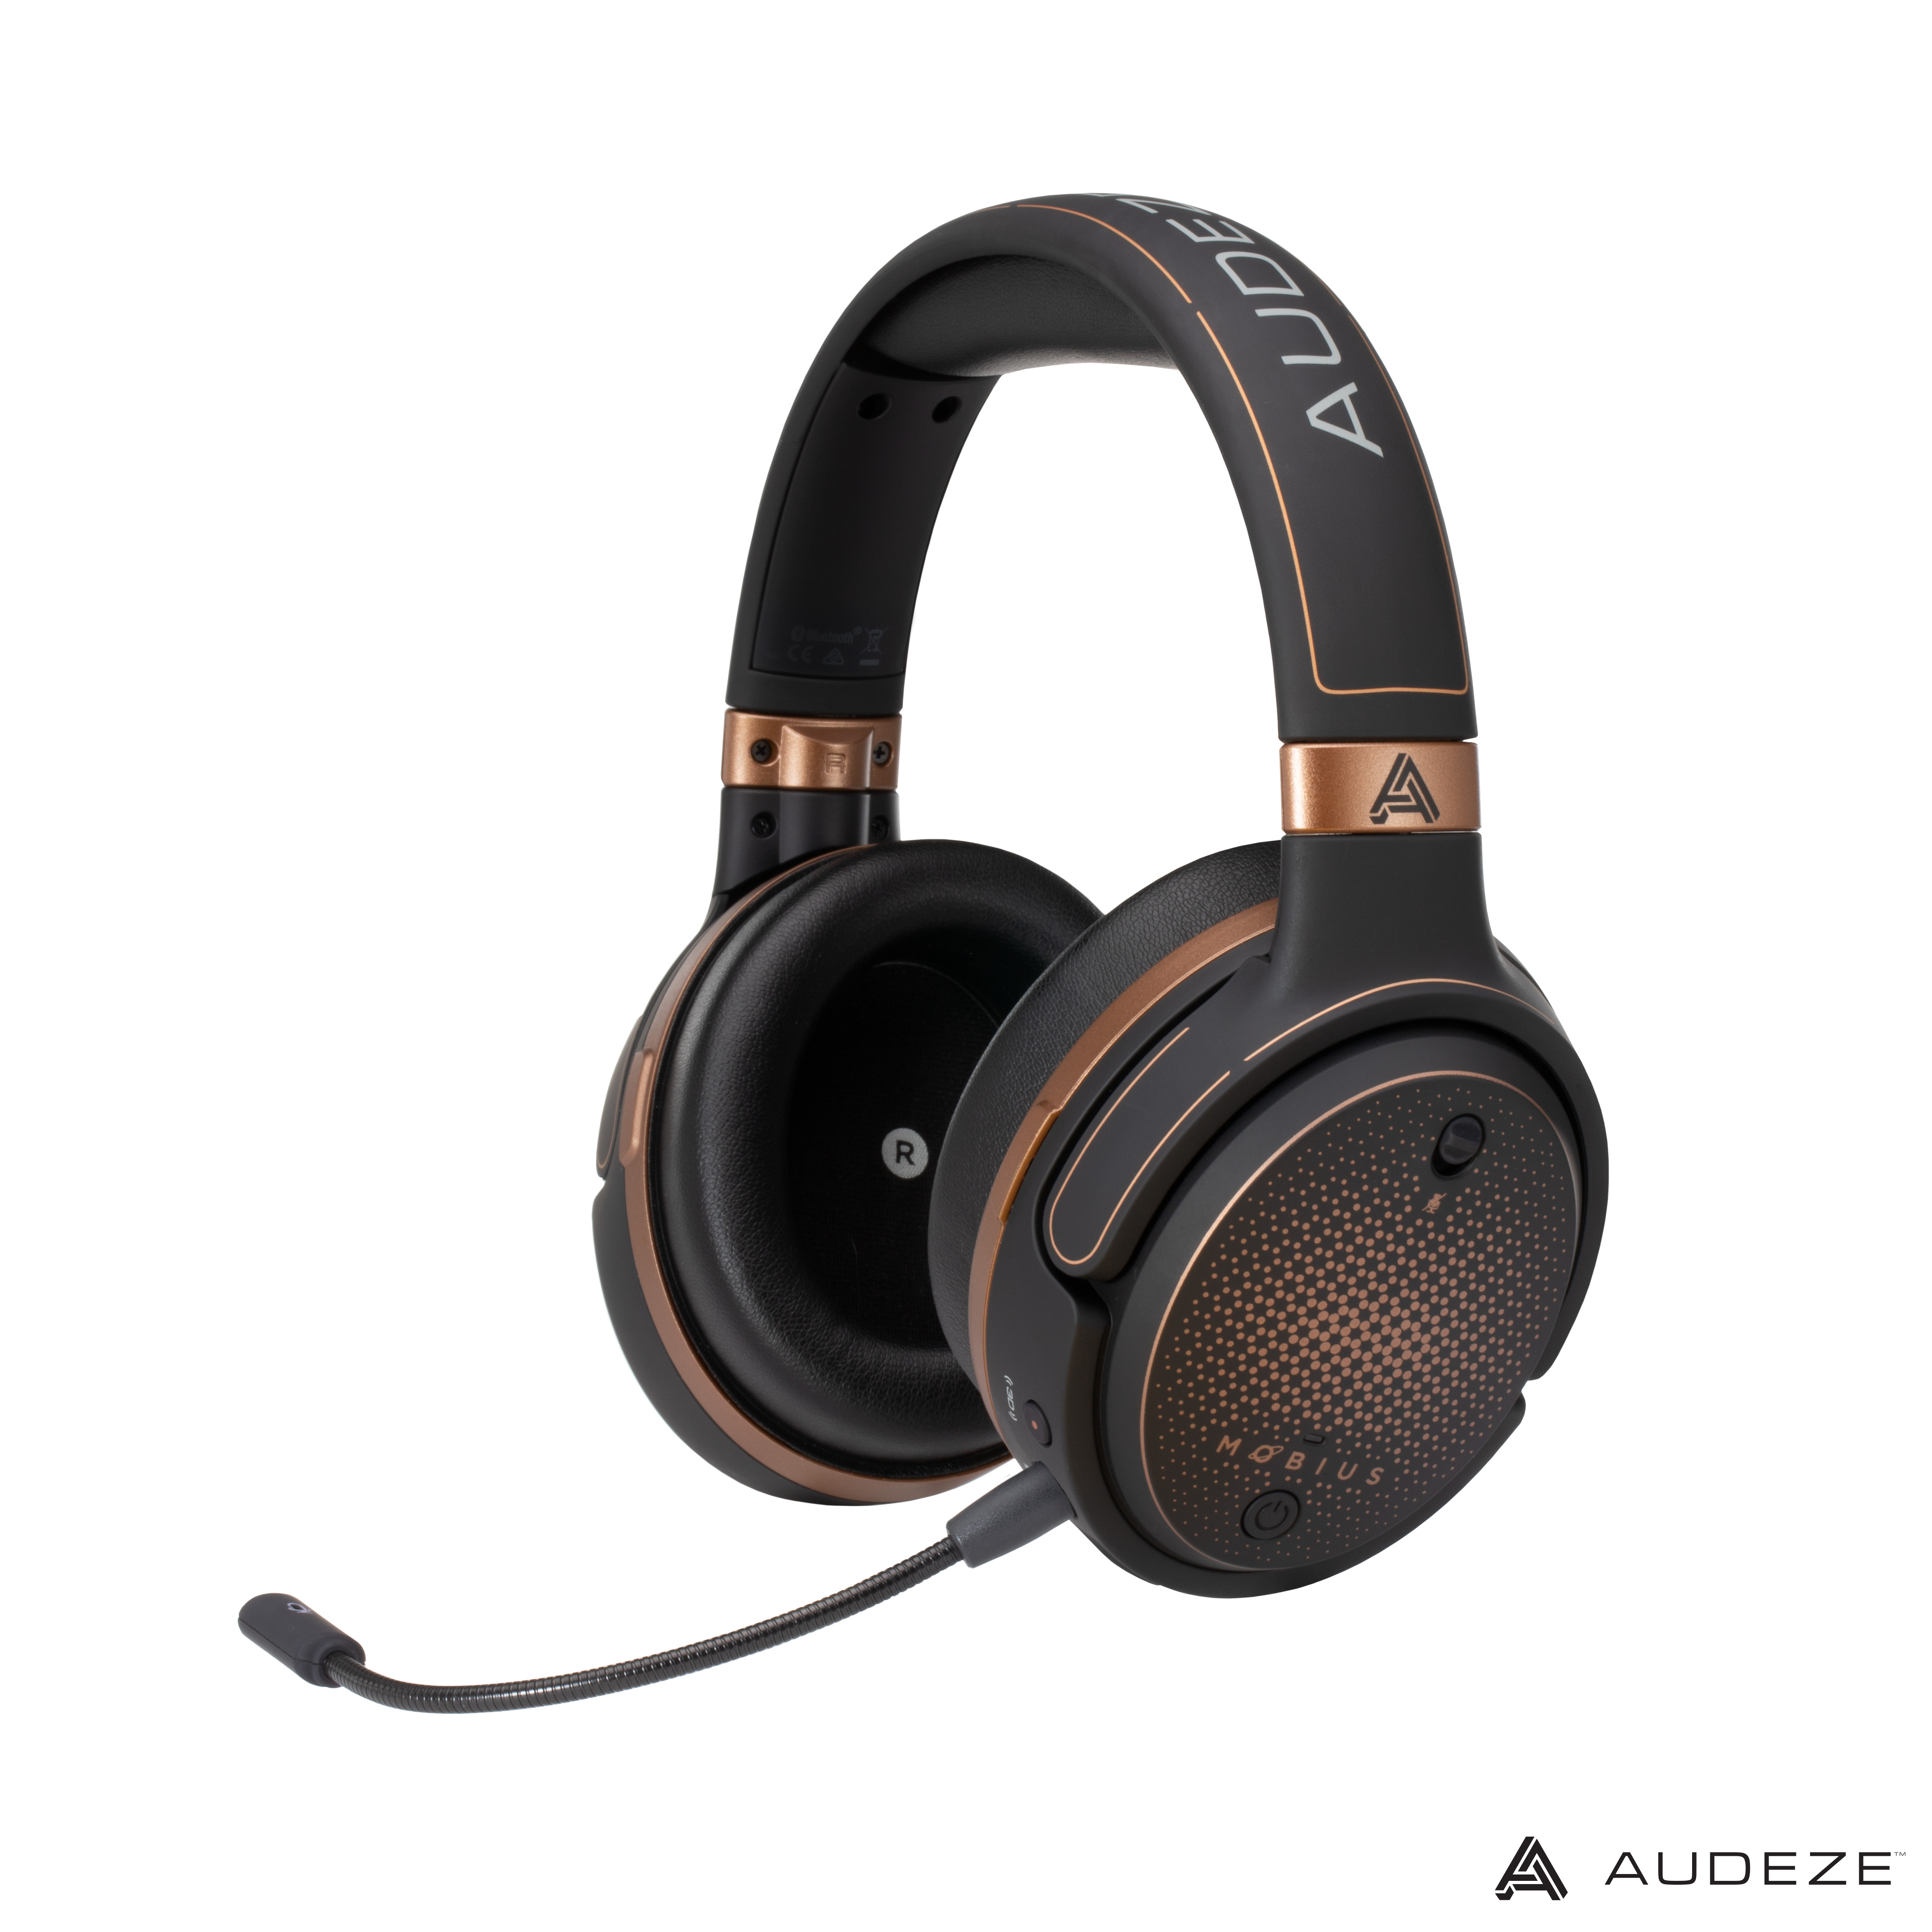 award-winning-gaming-headphones-audeze-mobius-now-available-at-amazon-frikigamers.com.jpg